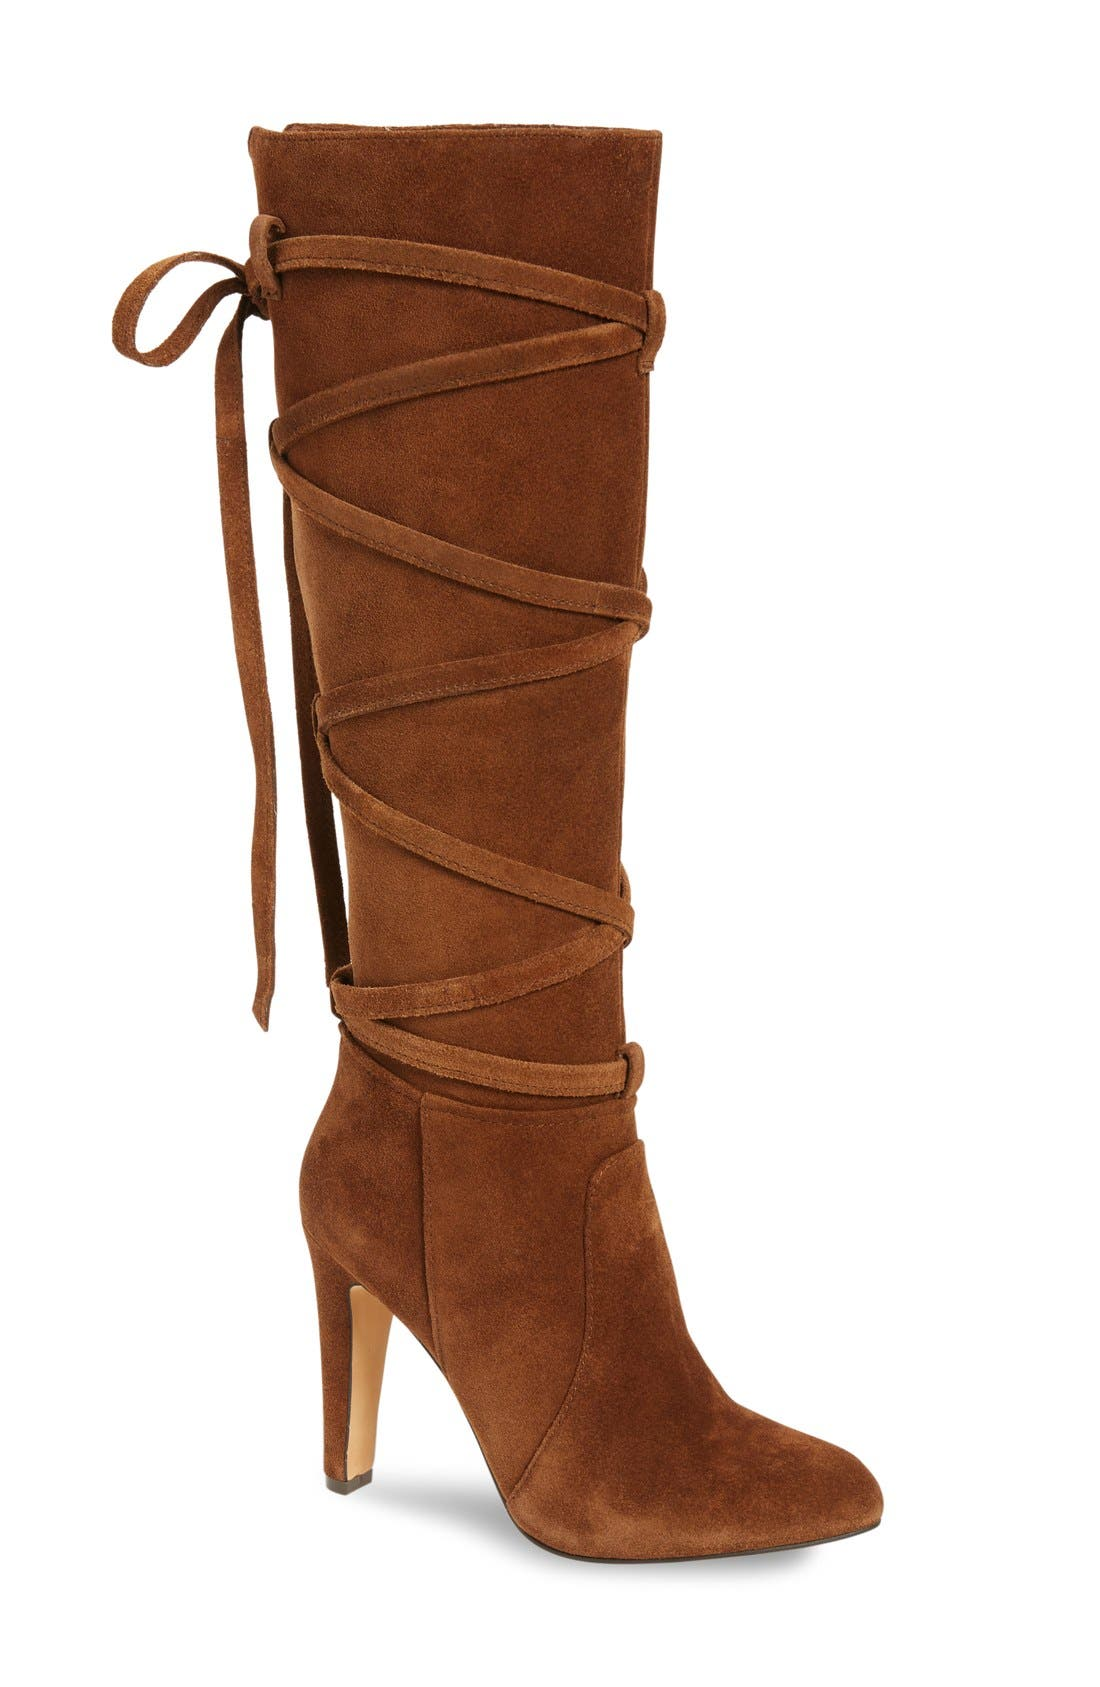 Main Image - Vince Camuto 'Millay' Knee High Boot (Women)